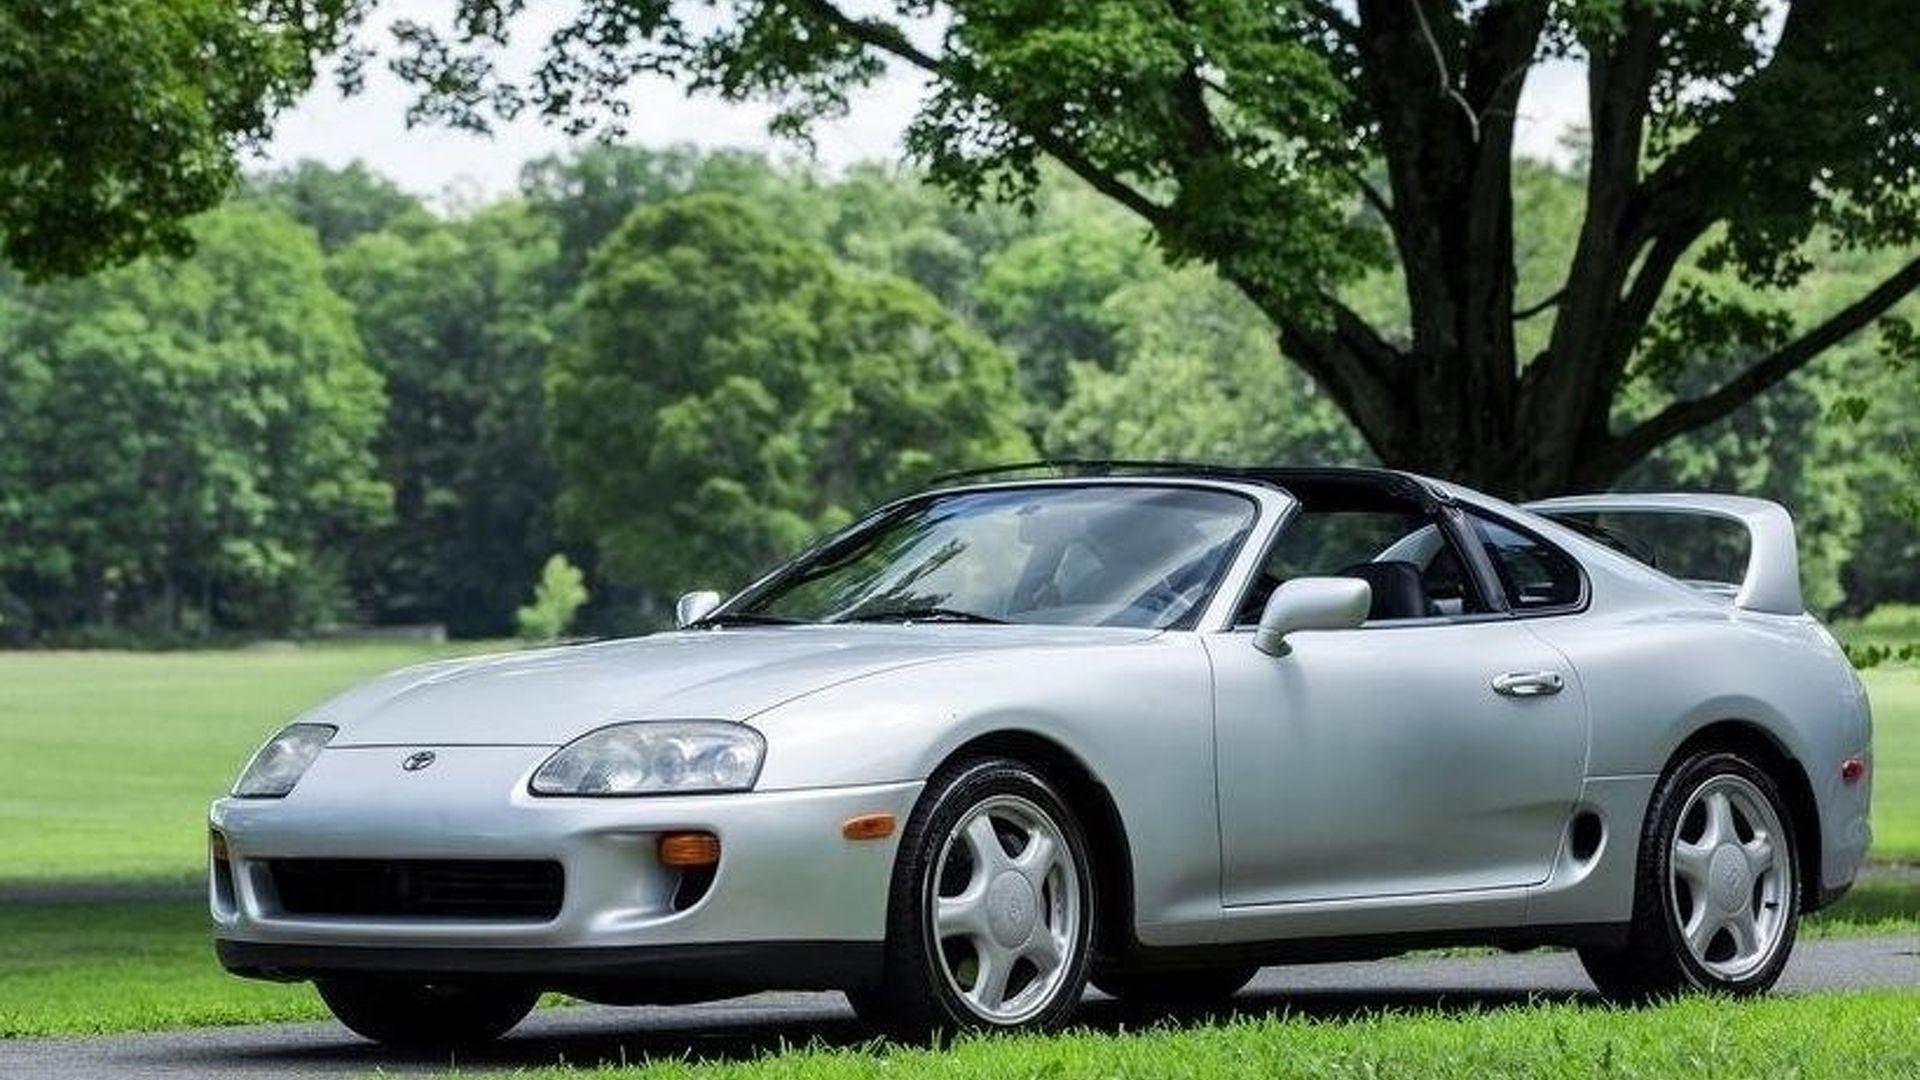 1994 Toyota Supra Ebay Find Is All Thrills No Frills